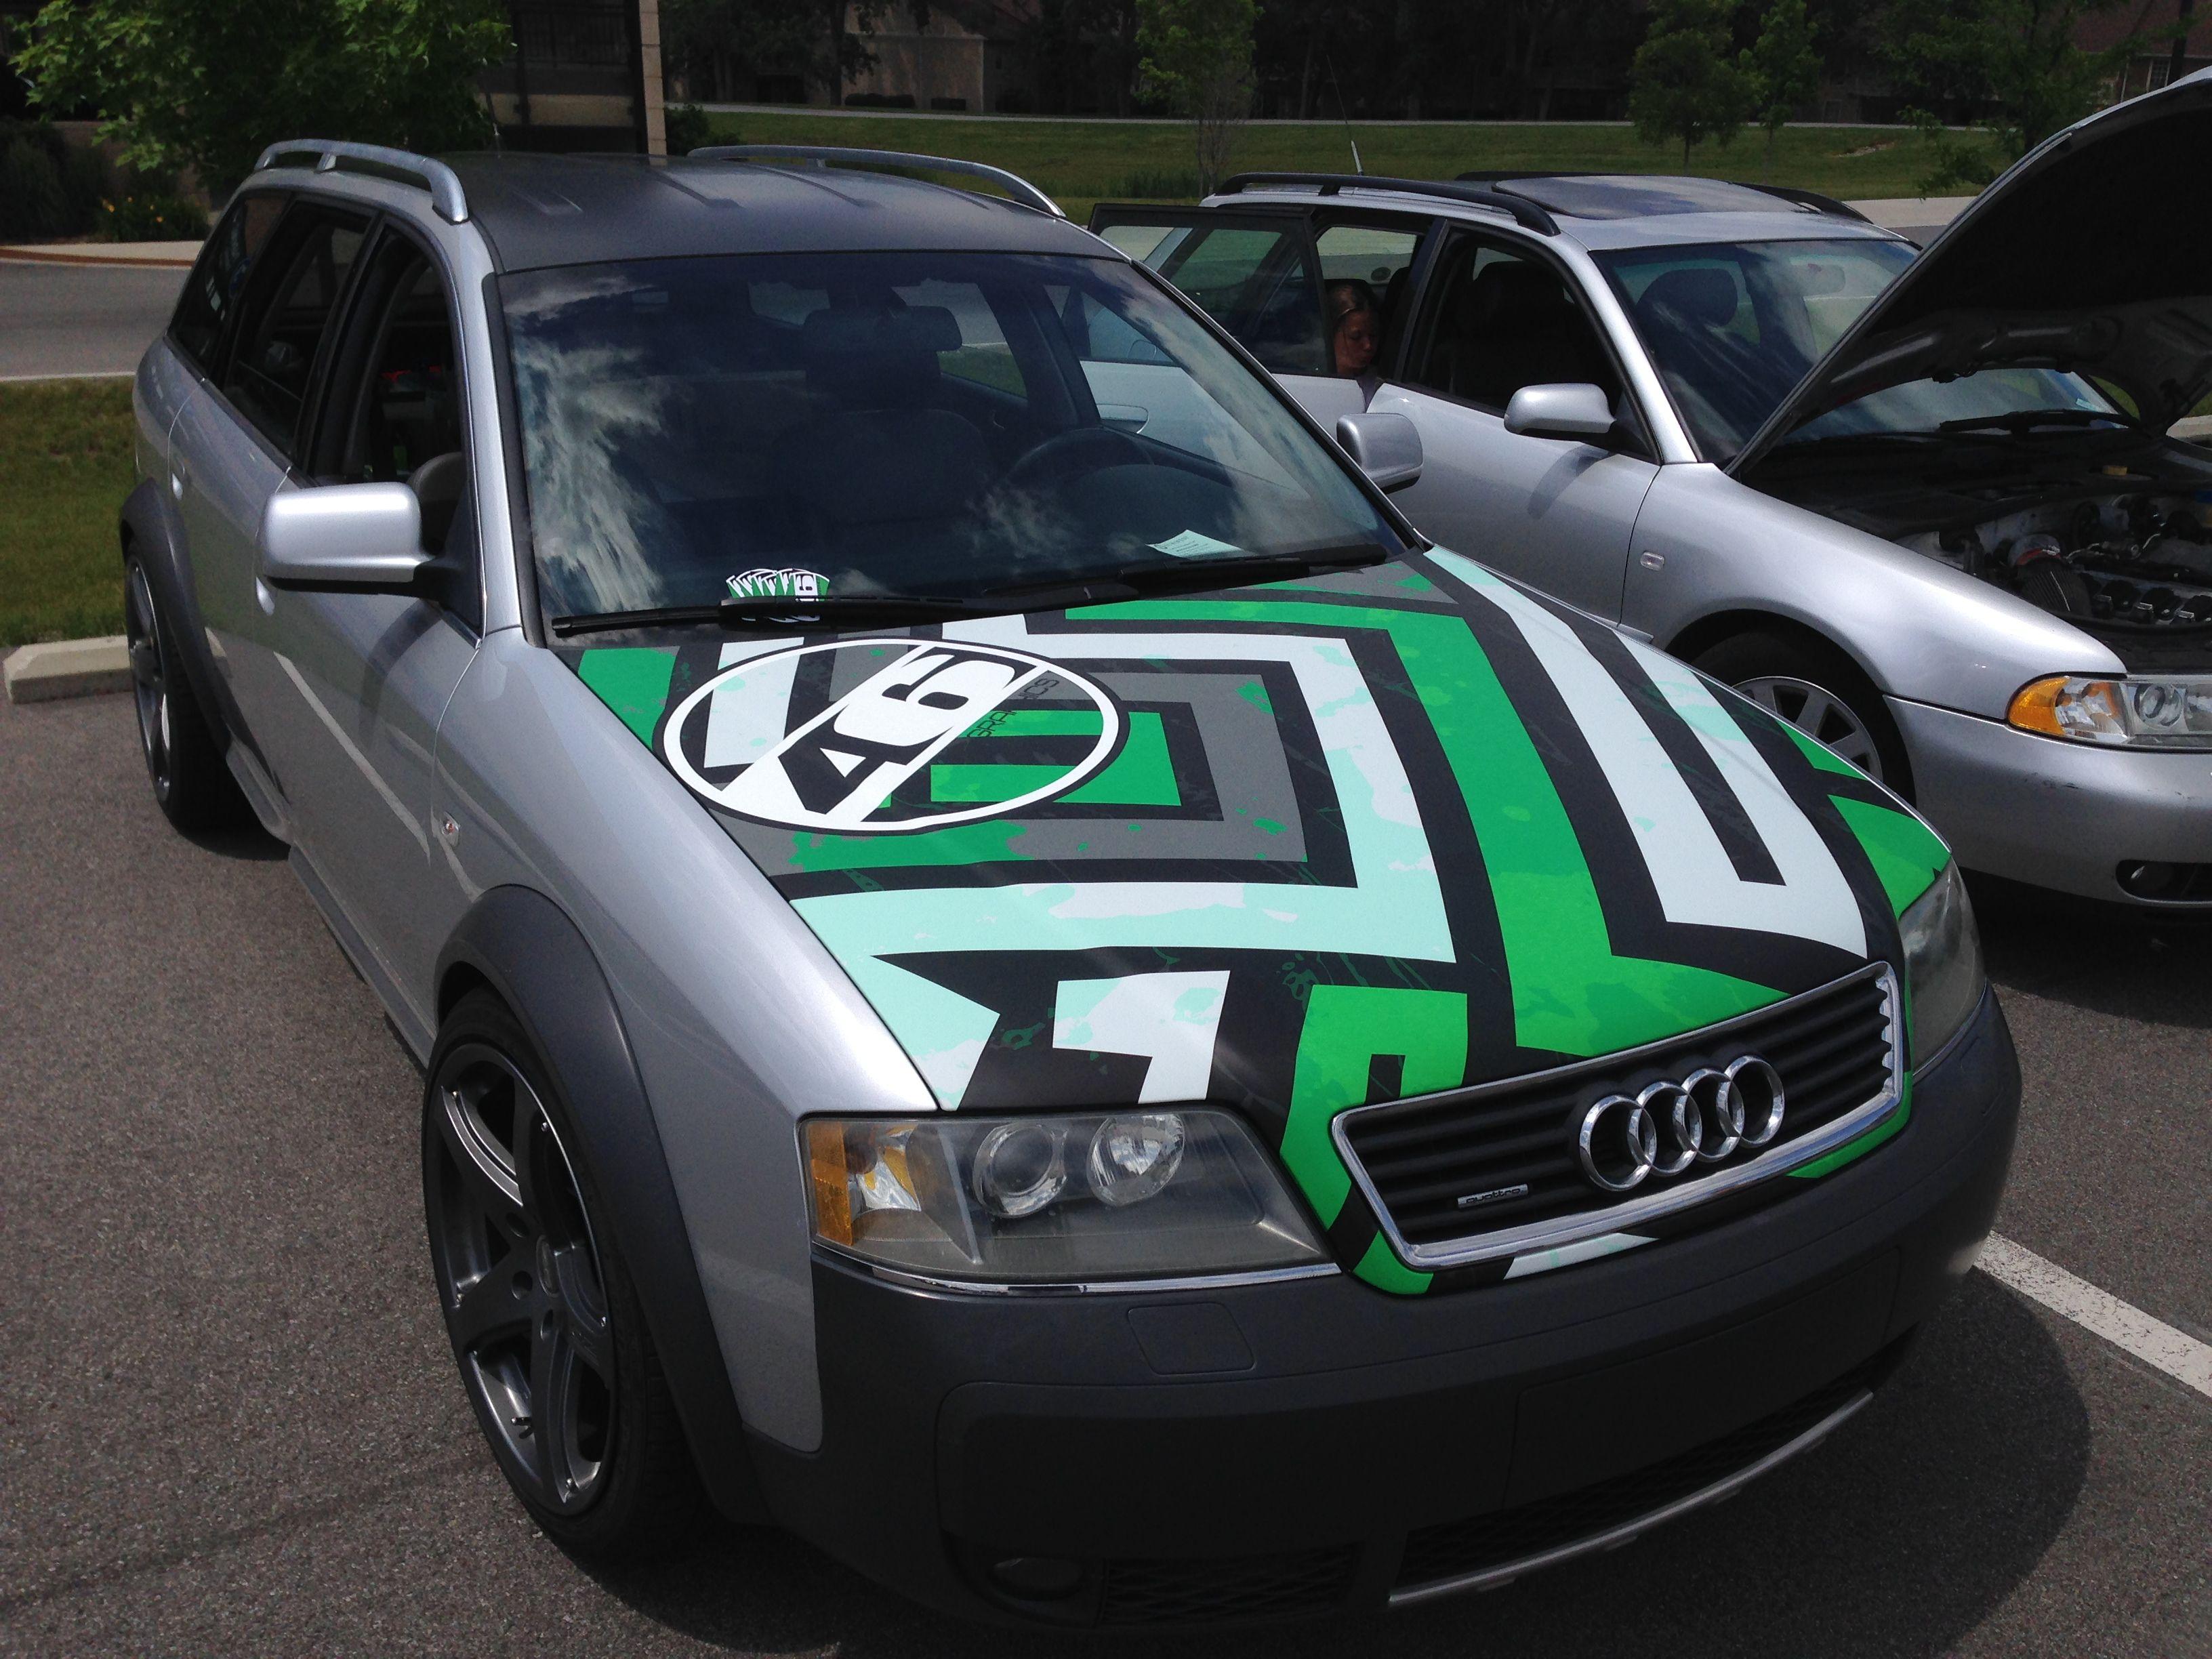 Custom Hood Wrap Really Changed The Look Of This Audi Allroad - Custom vinyl car hood decalscustom vinyl car graphics installation chicago il